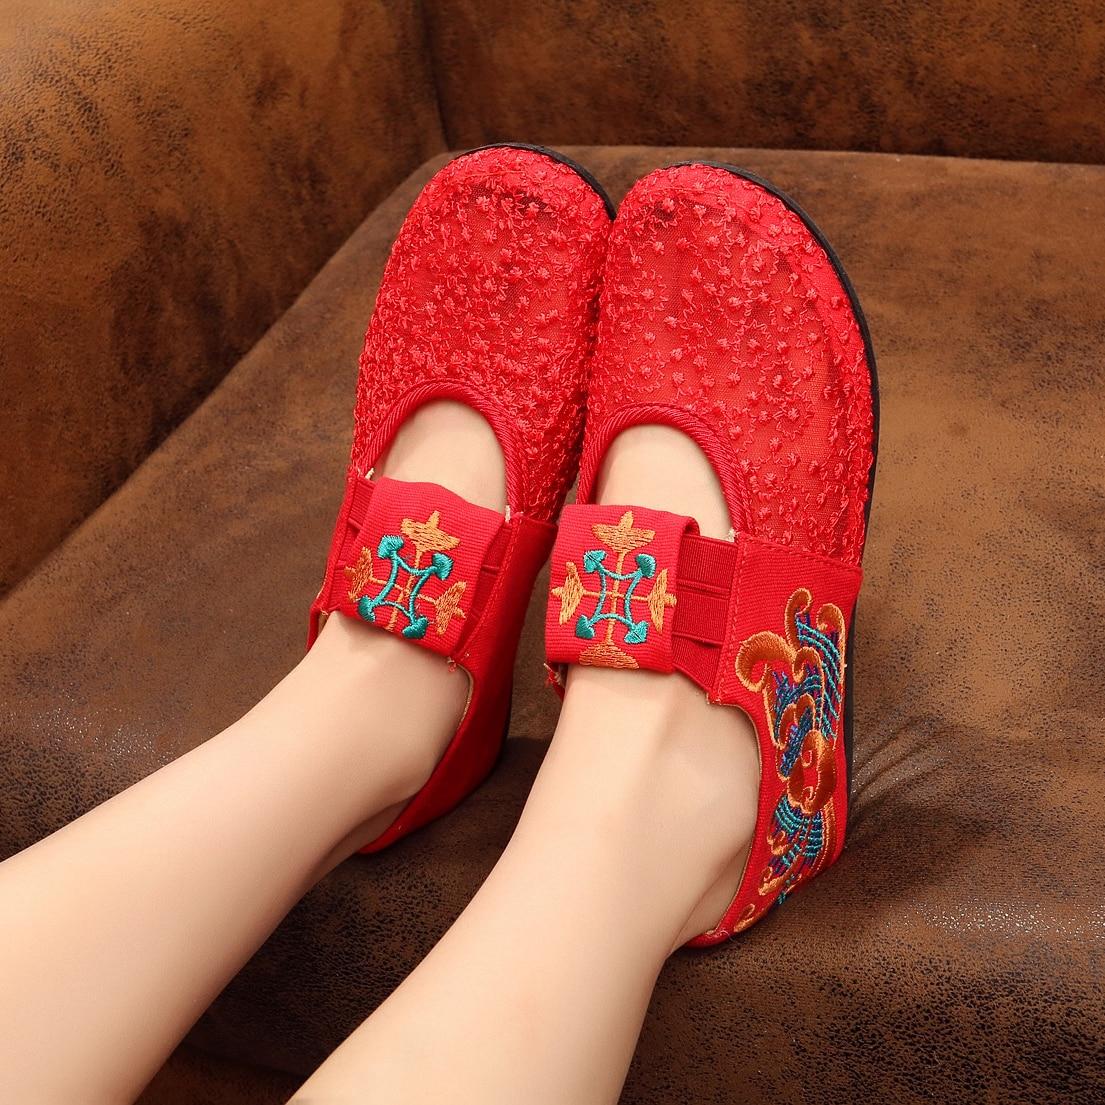 New summer design shoes women fashion lace mesh woman shoes flats bud silk flower shoes one colour<br><br>Aliexpress